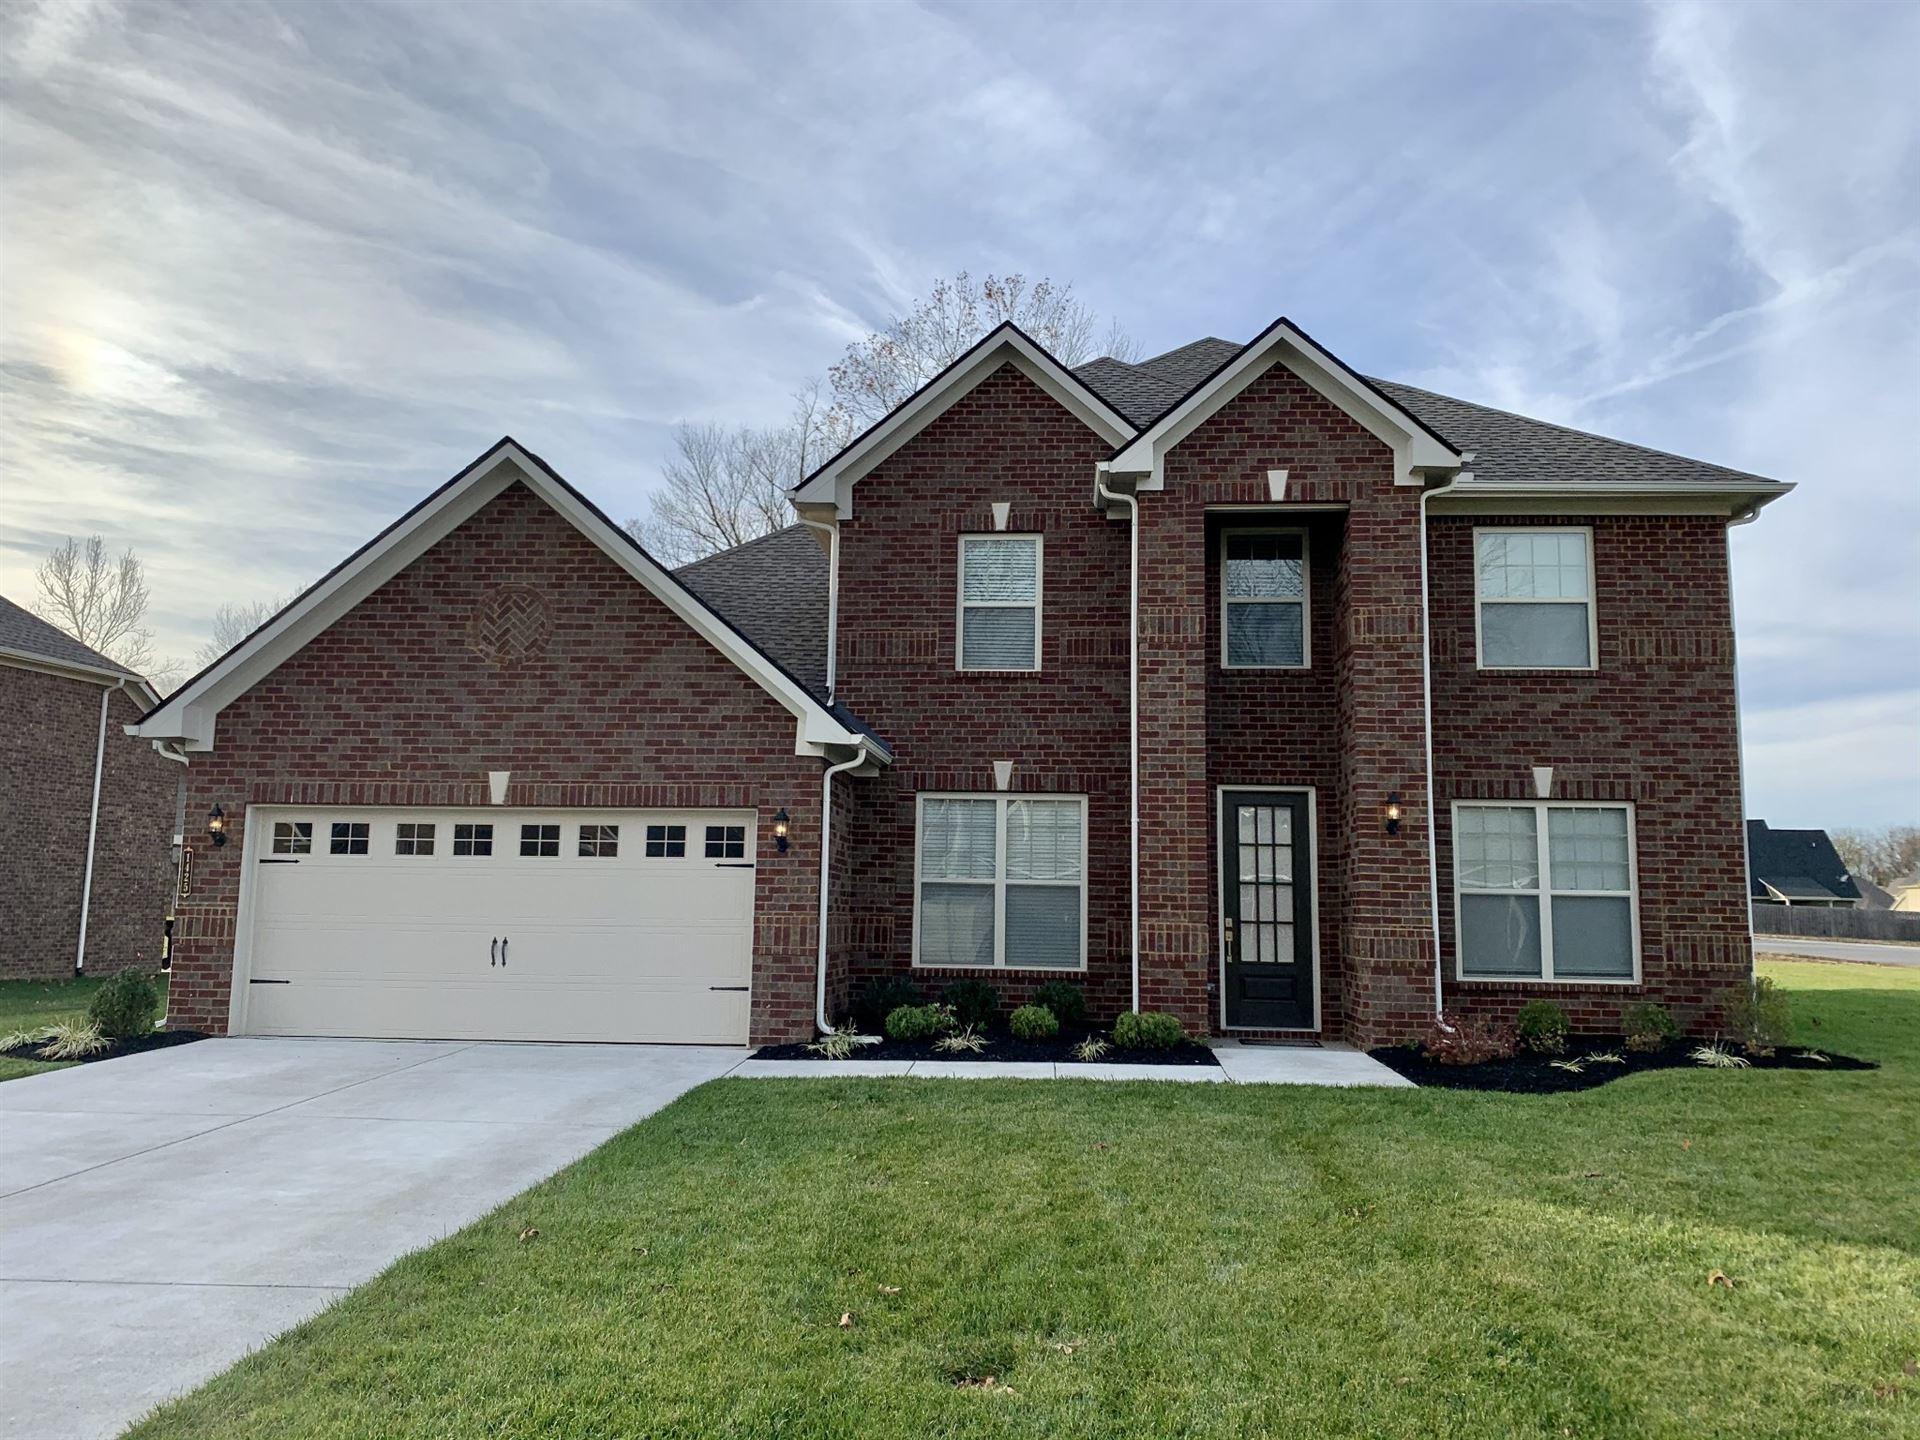 1425 Blackman Woods Ct, Murfreesboro, TN 37128 - MLS#: 2210244